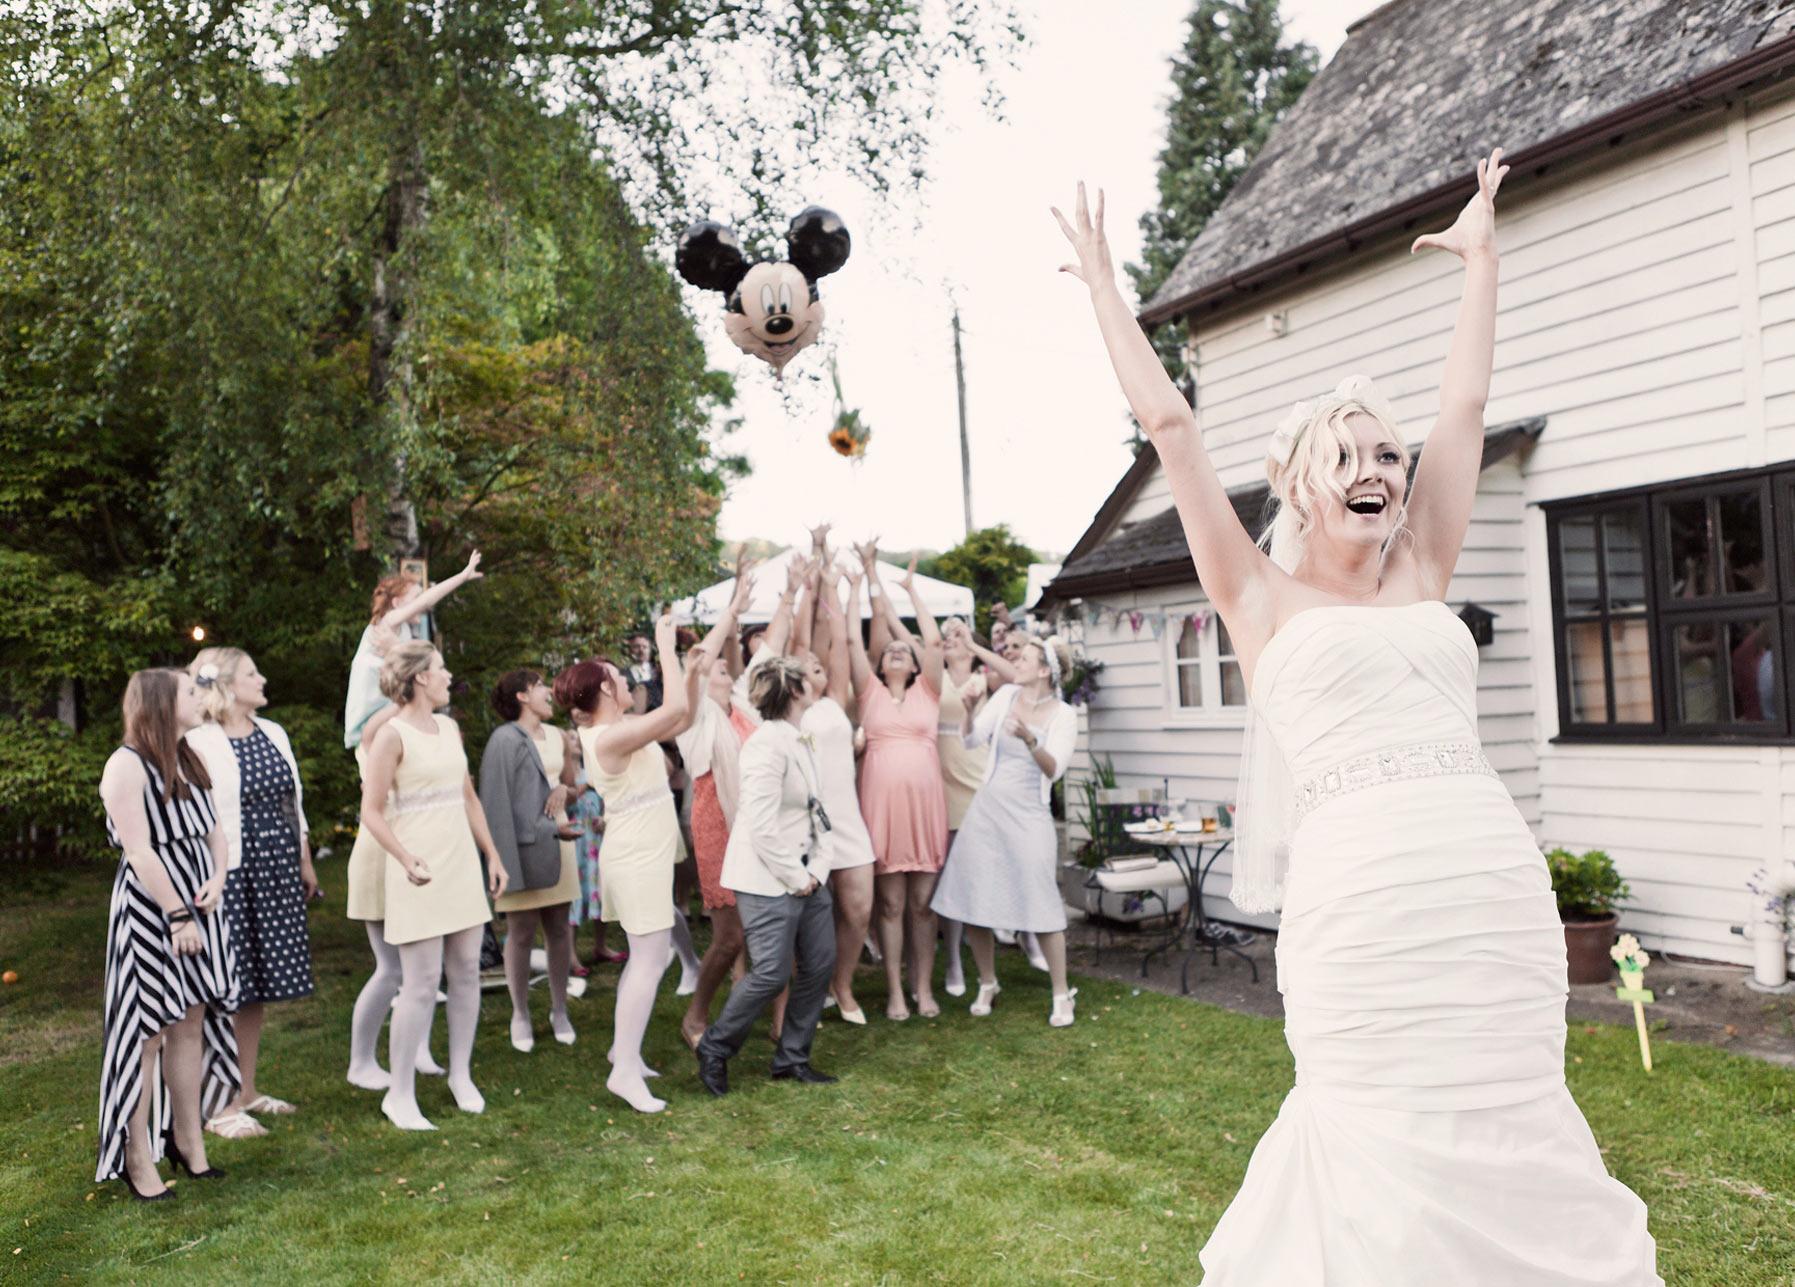 Bride throwing her wedding bouquet